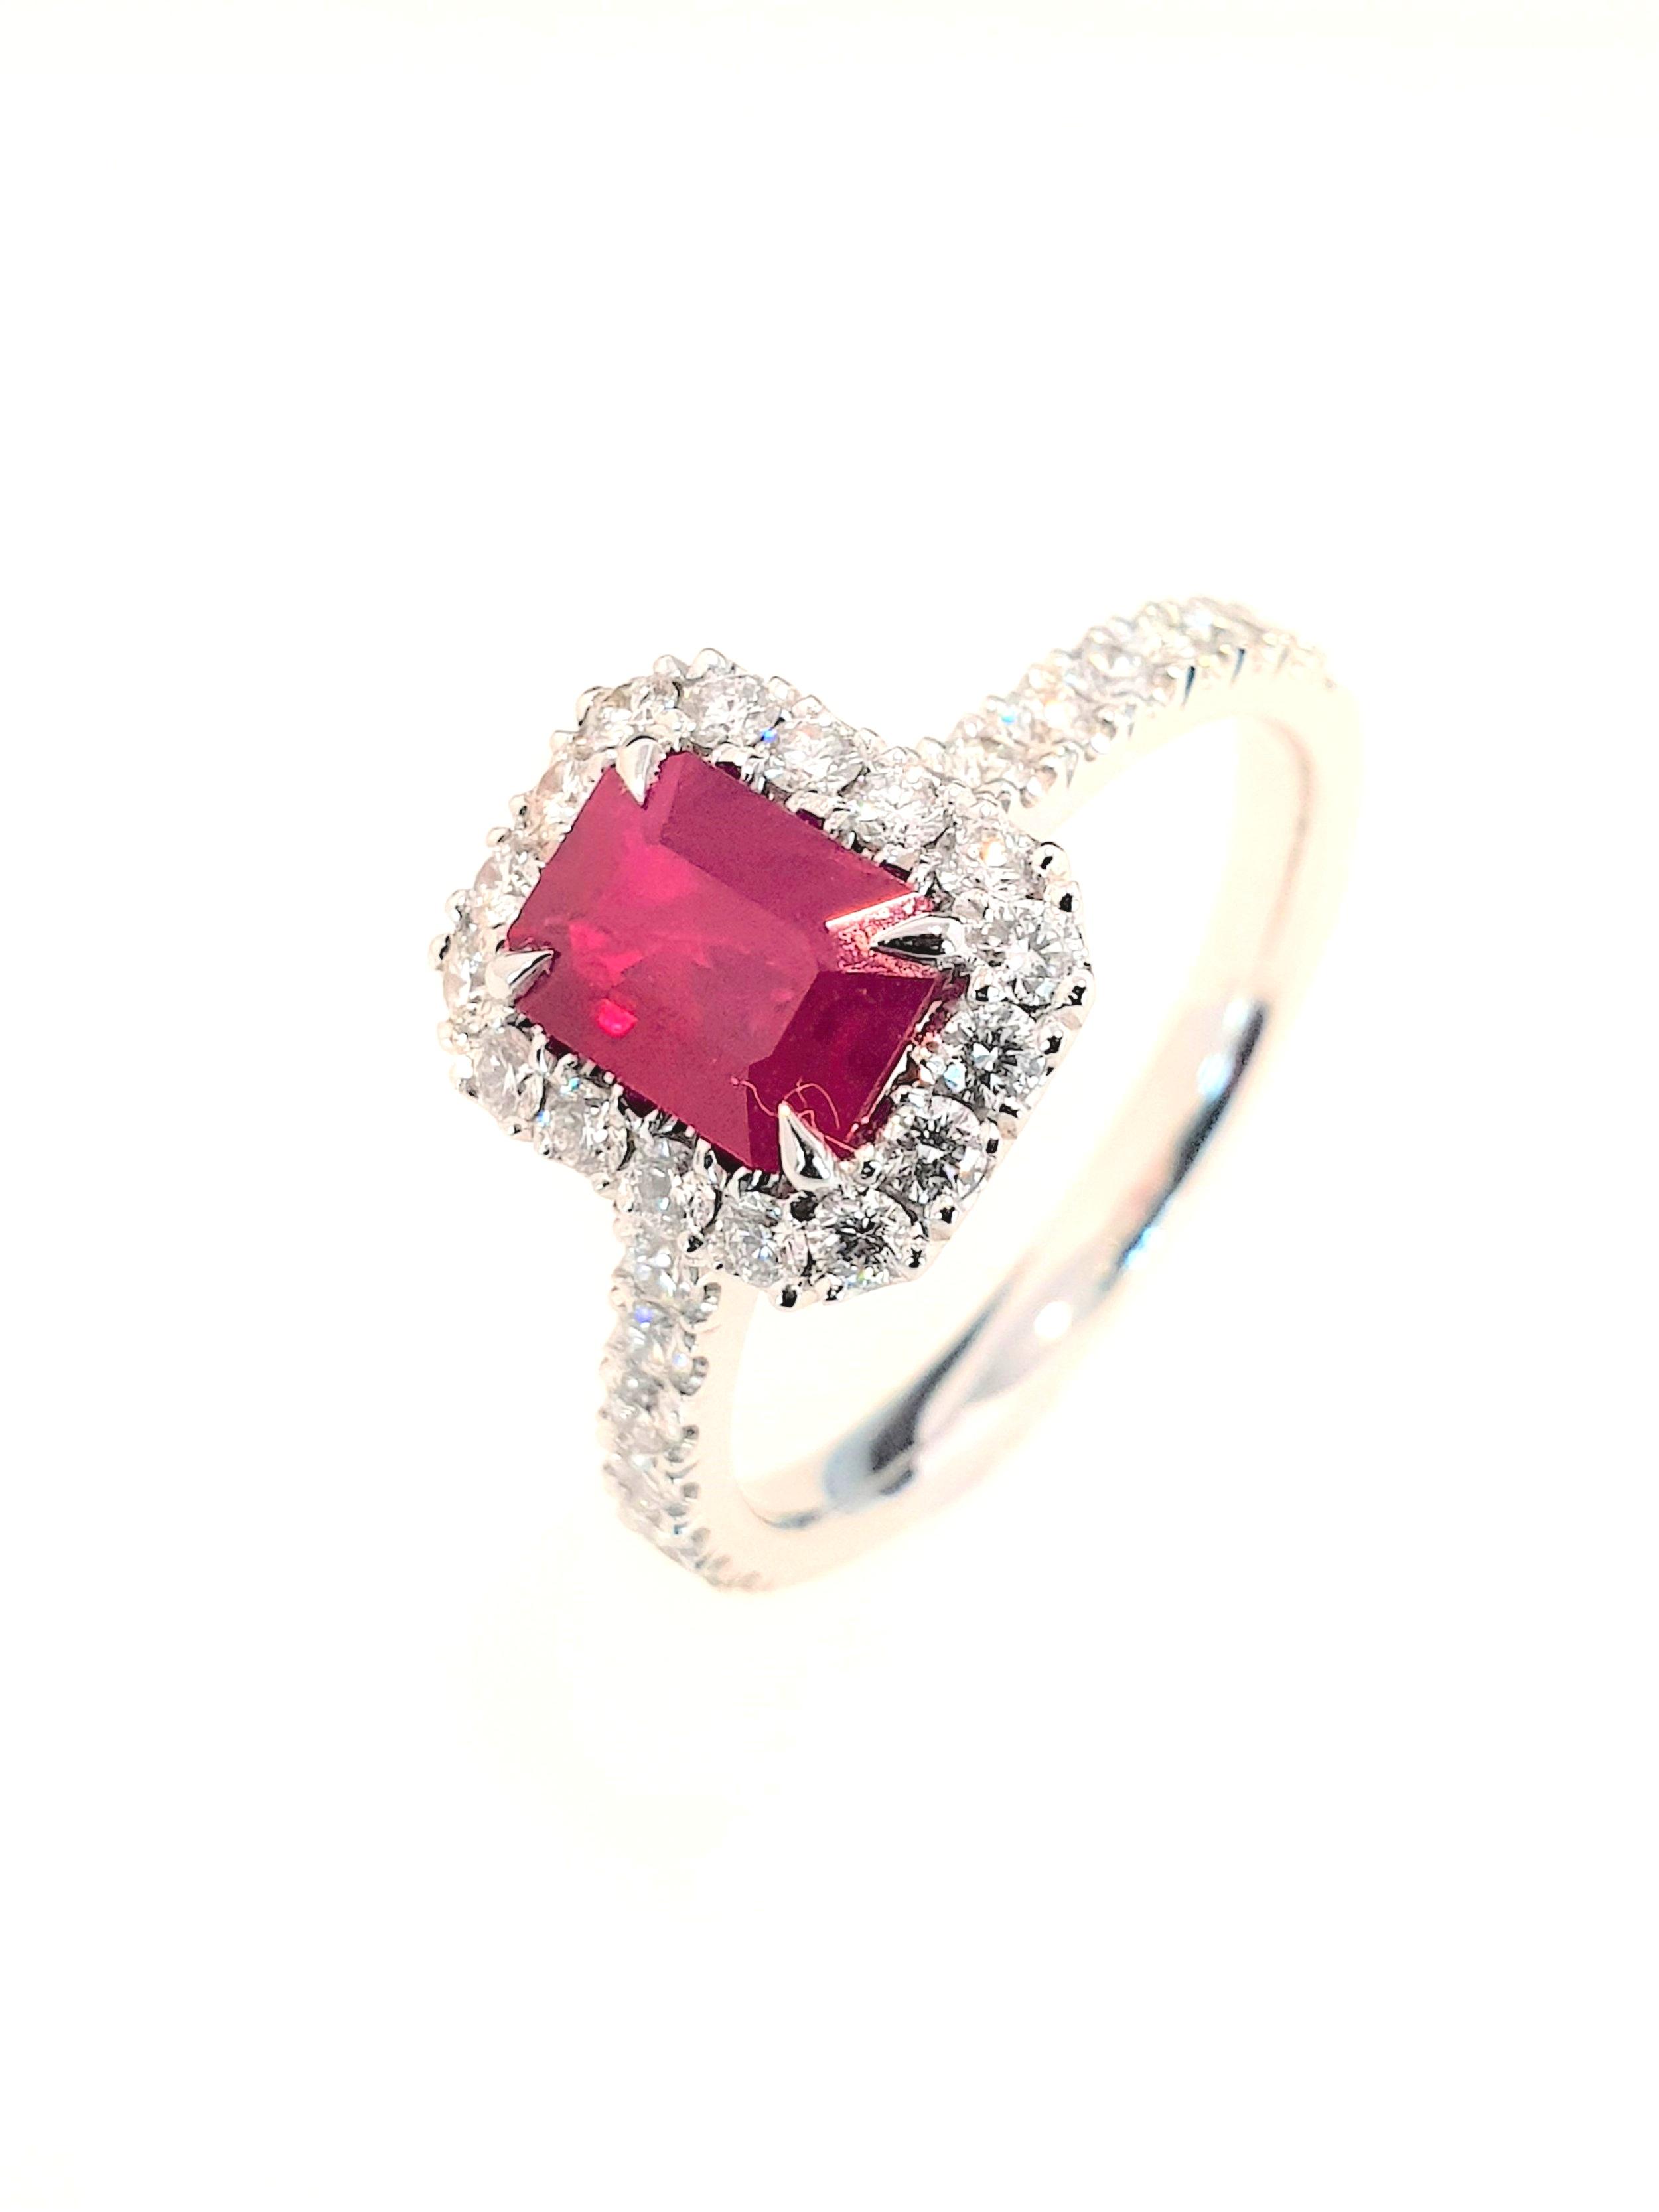 Platinum Ruby(1.04ct) & Diamond Ring  Diamond: .54ct, G, Si1  Stock Code: N8951  £5300